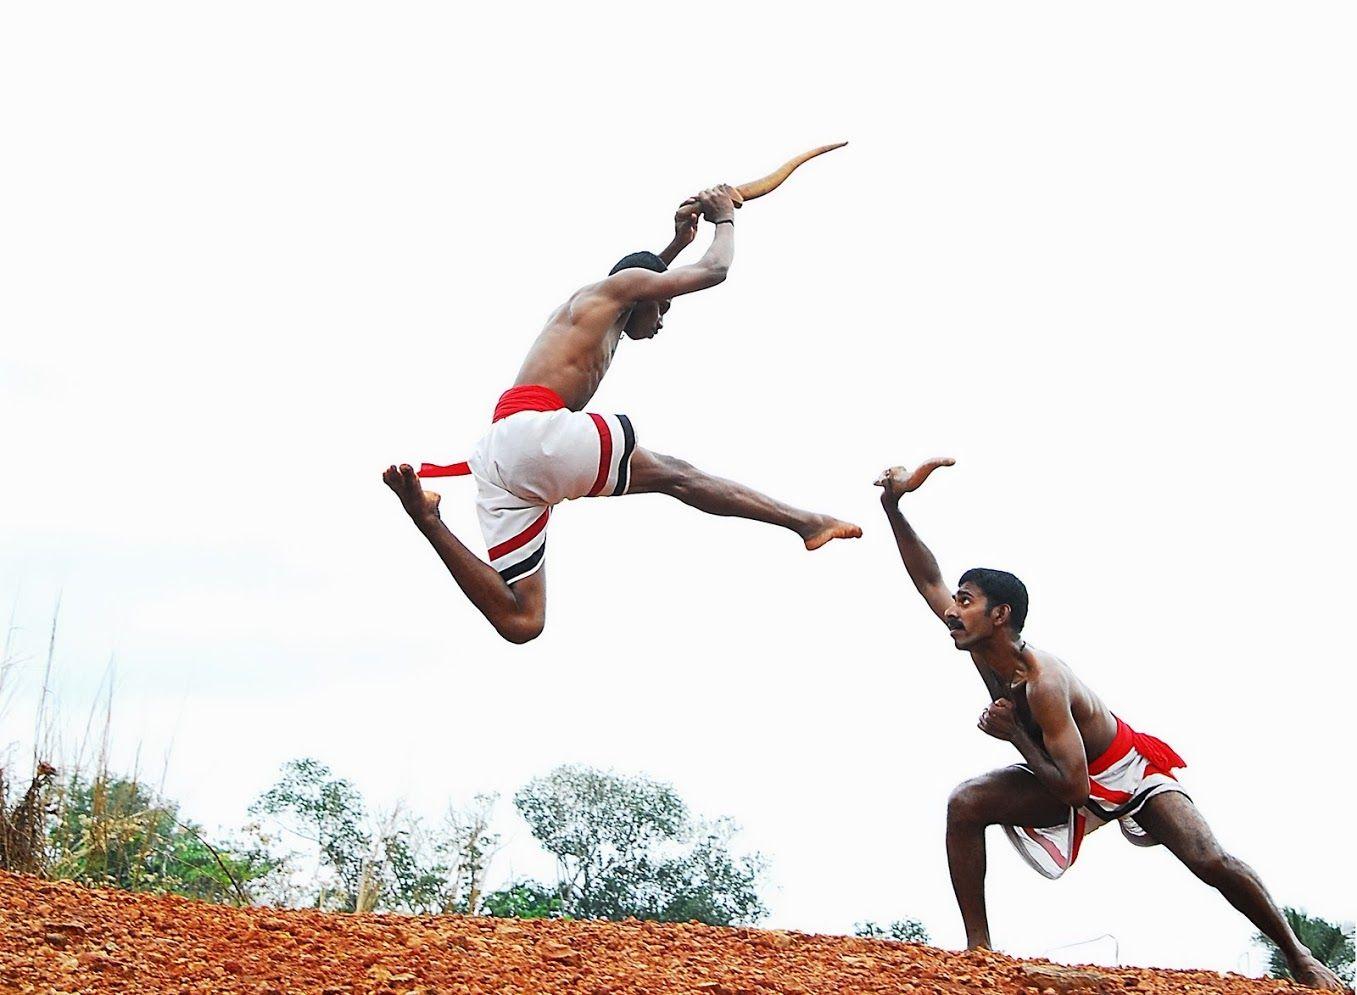 Kalaripayattu one of the most ancient martial art forms